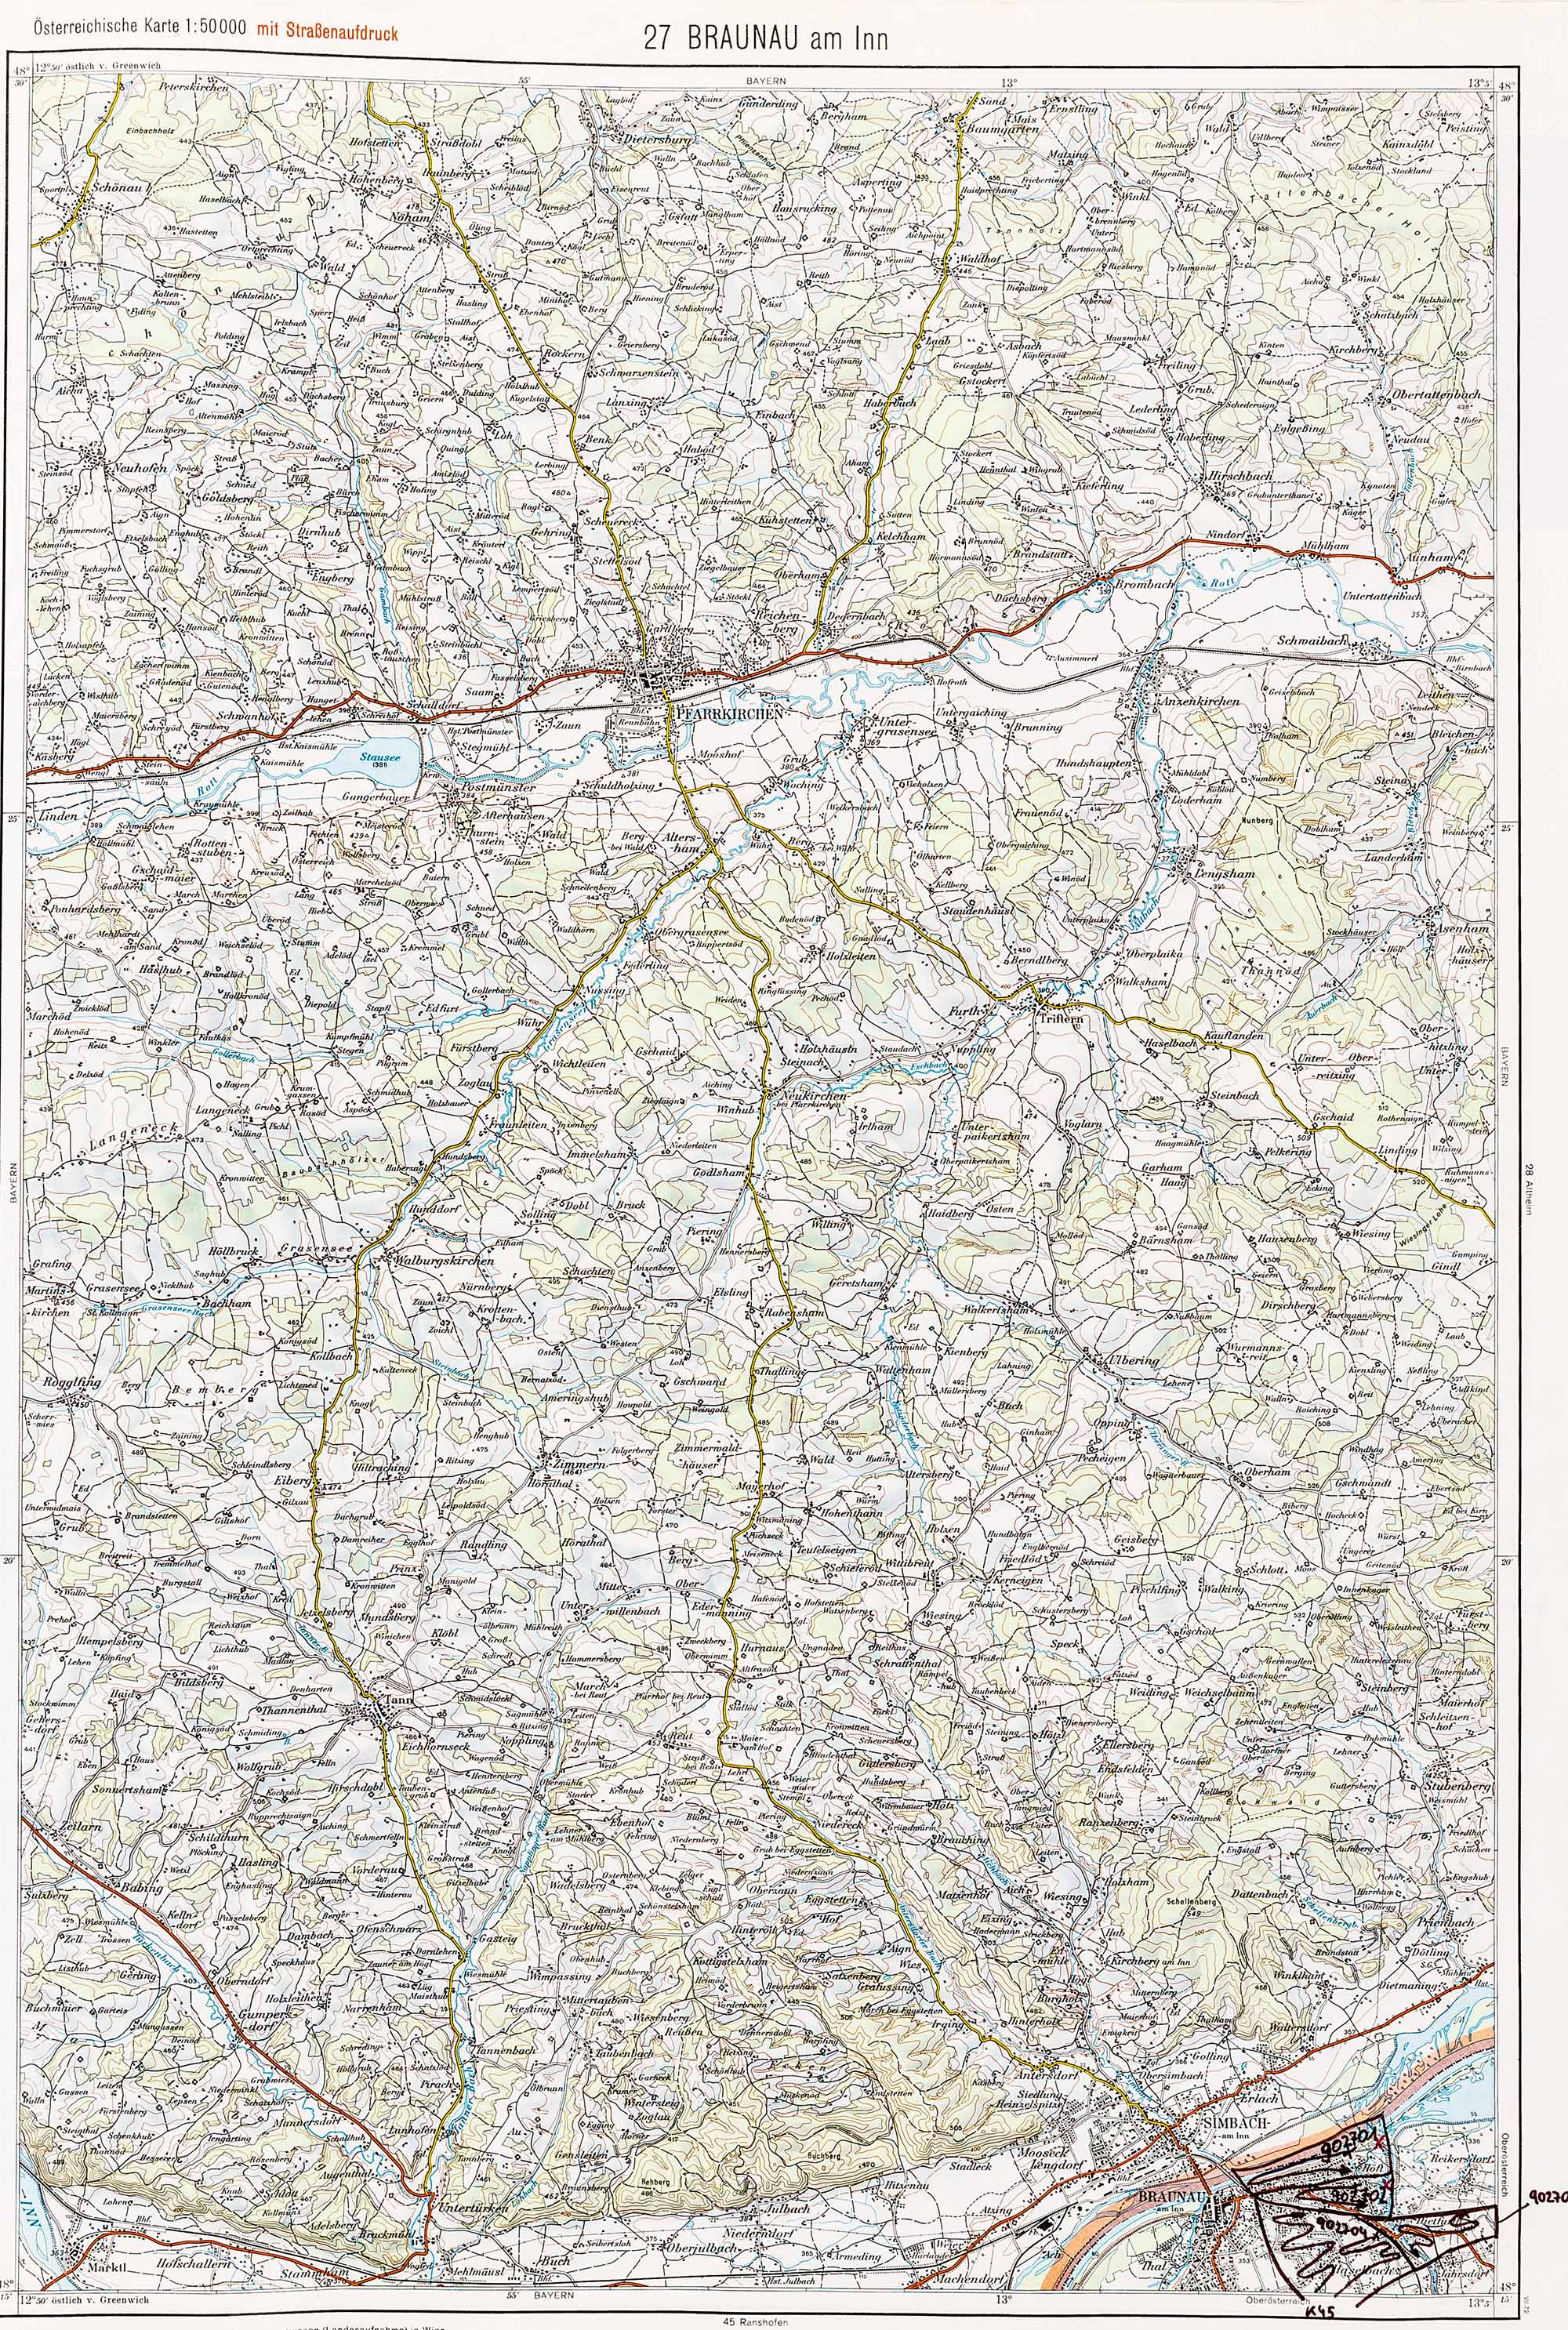 1975-1979 Karte 027